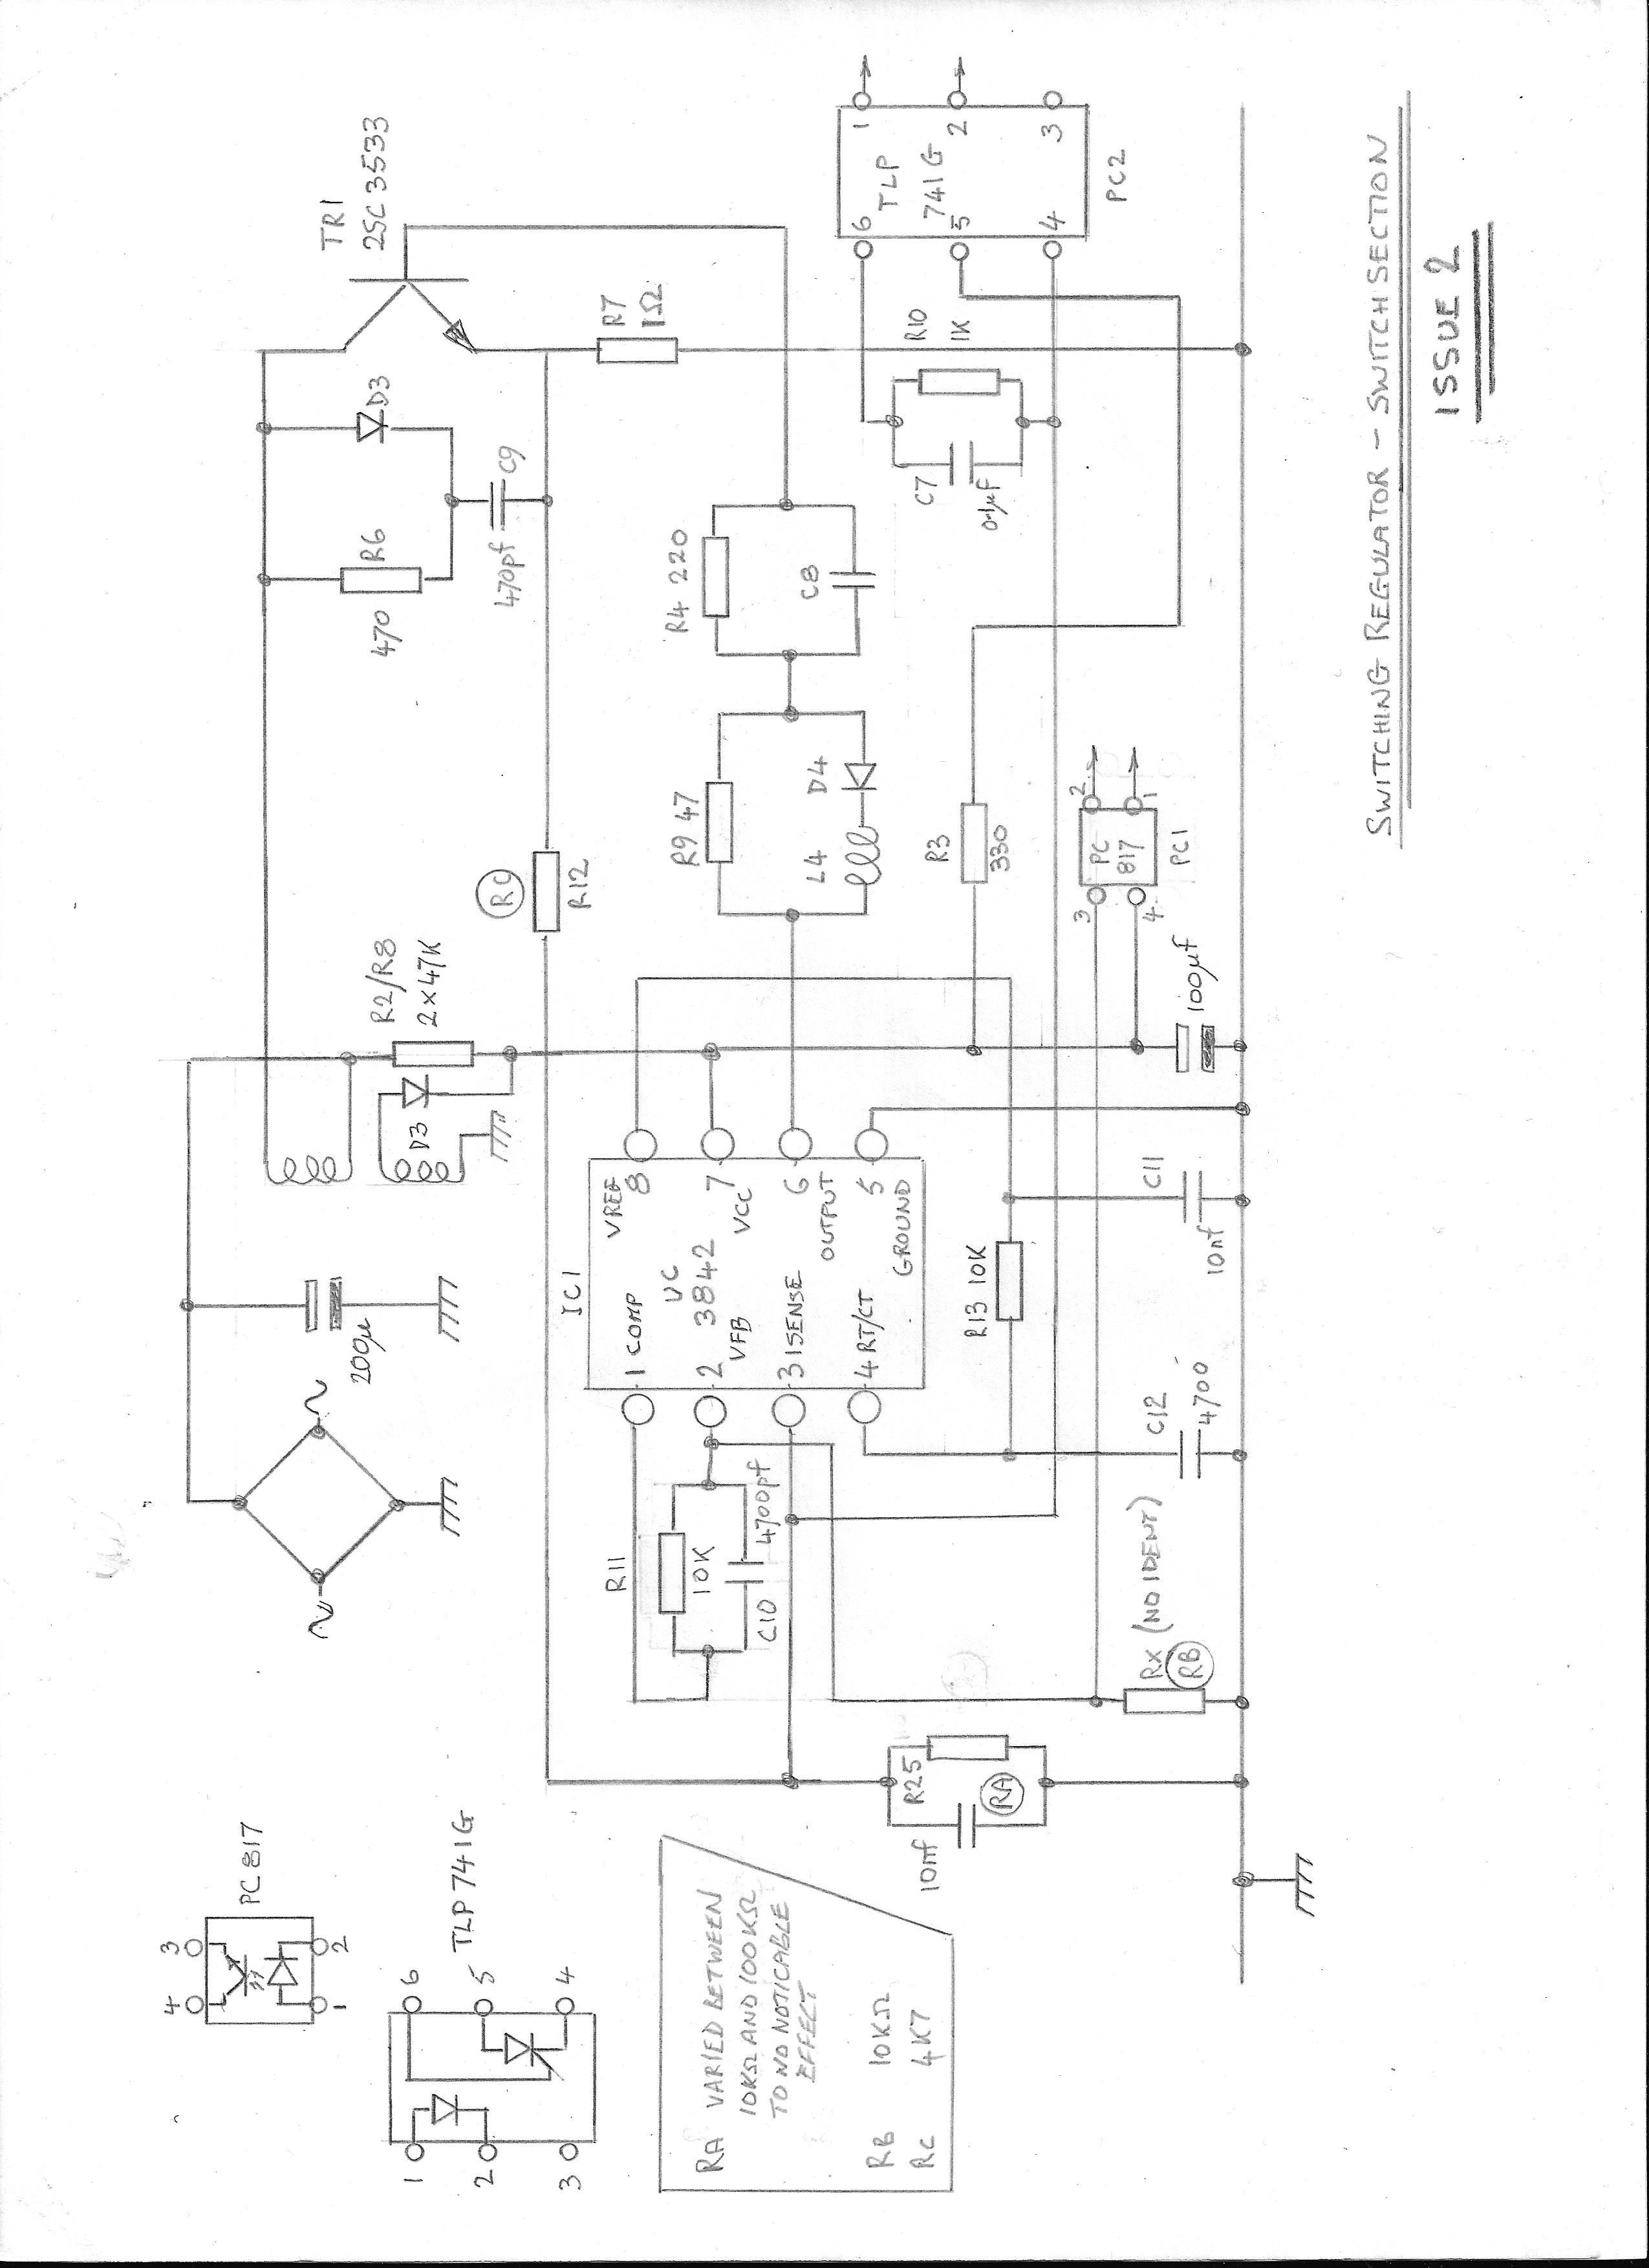 UC3842: Regulator not oscillating correctly - Power